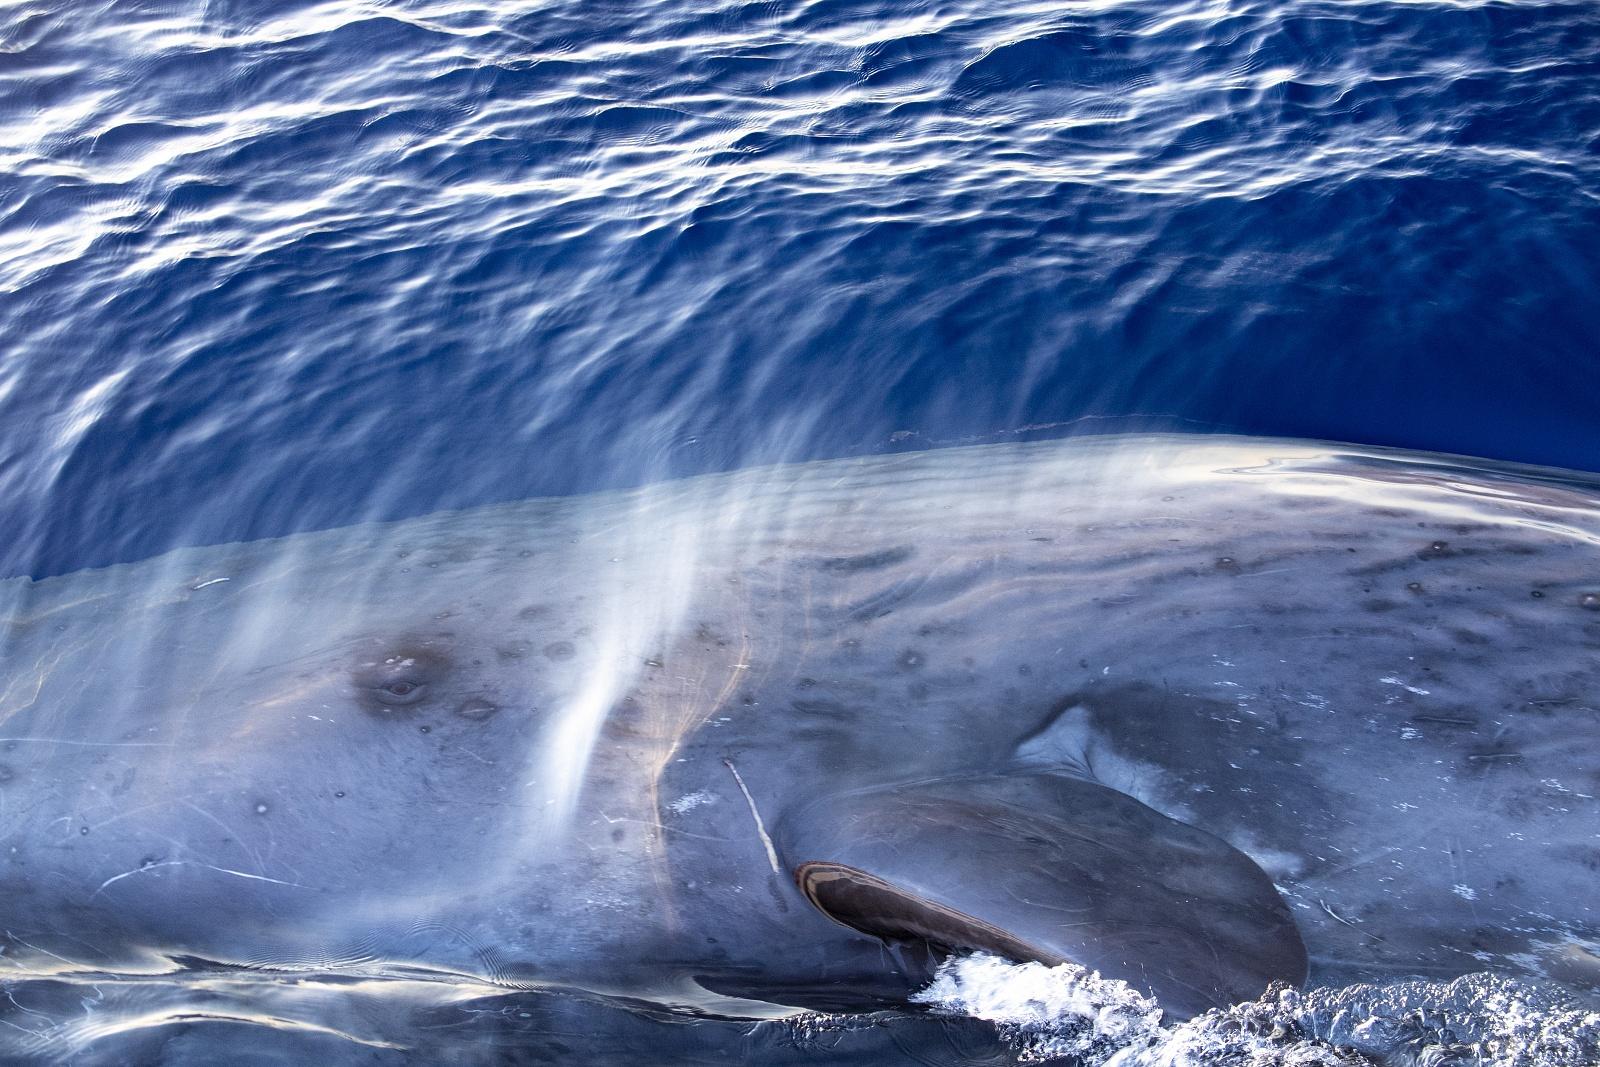 Elia the sperm whale - August 2020, Genoa, Italy